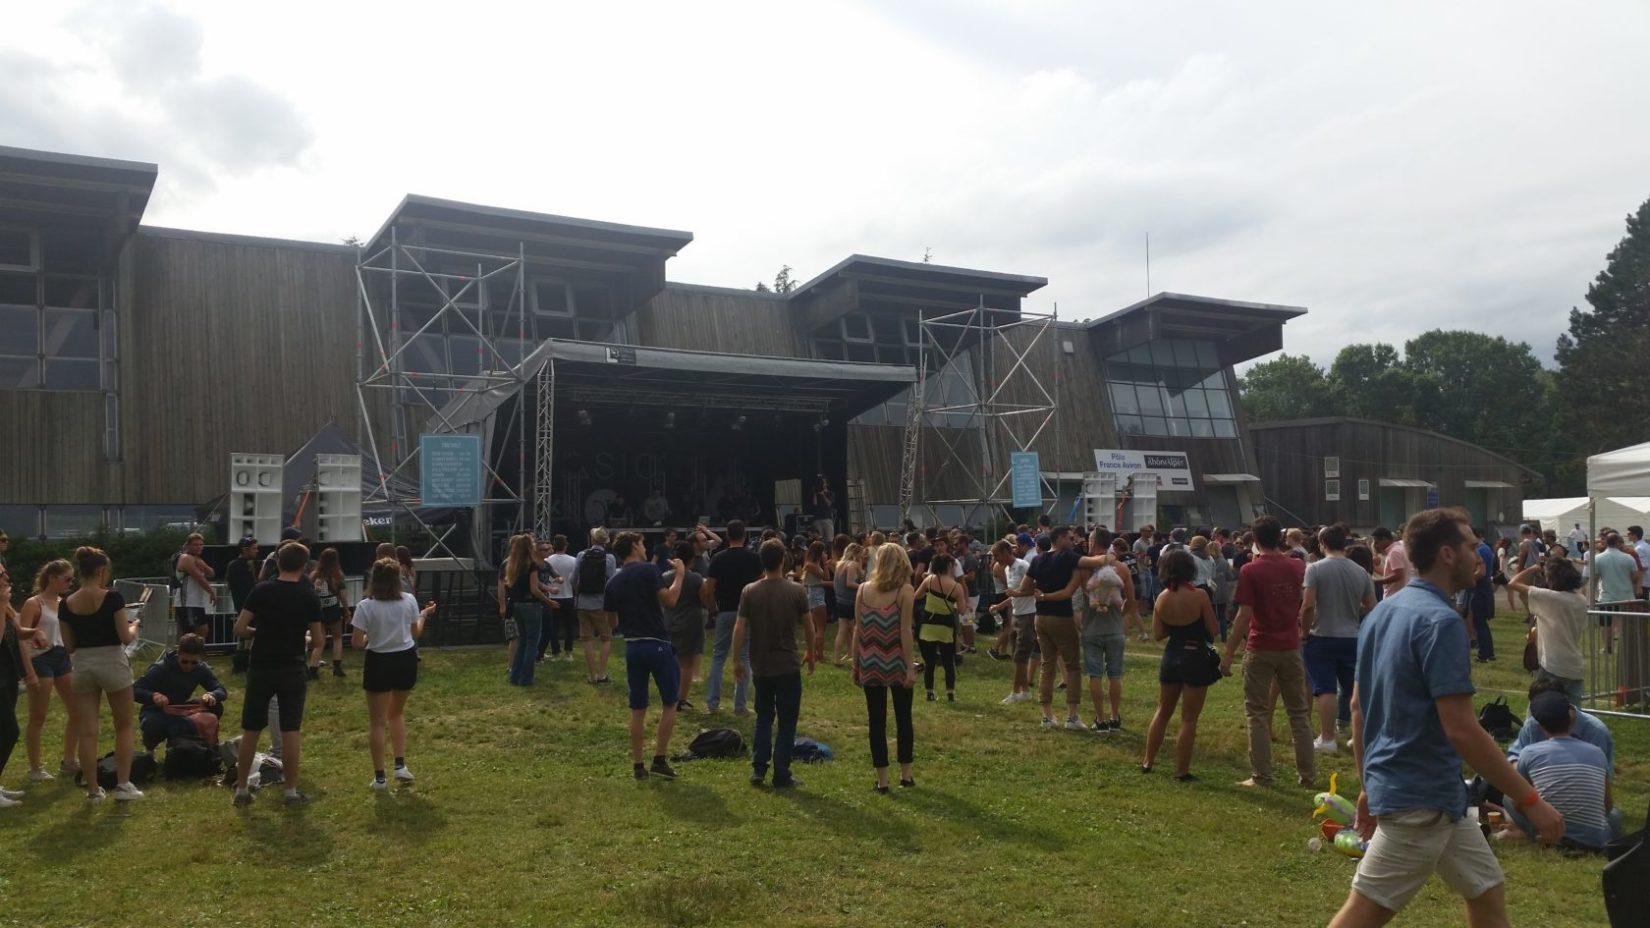 evasion festival scene